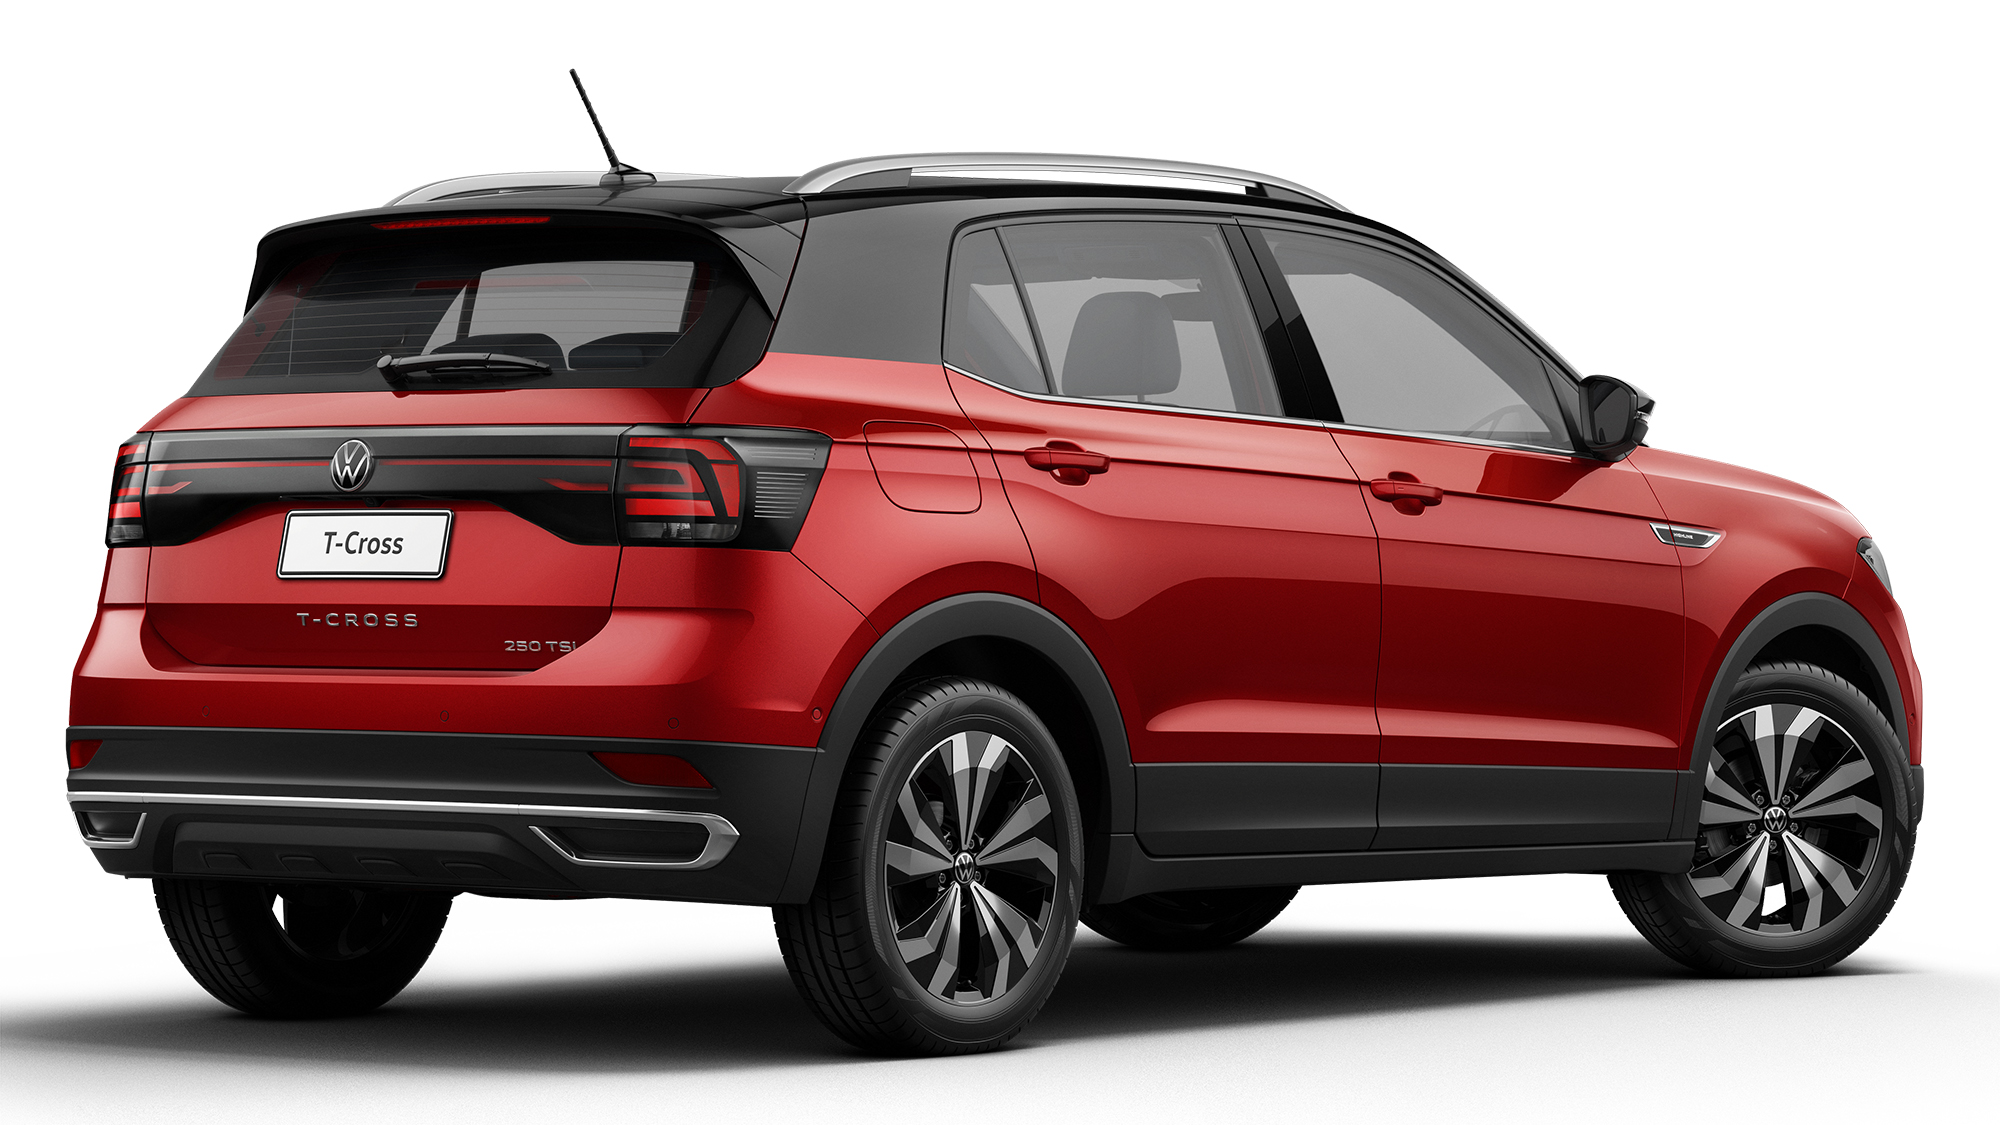 Volkswagen T-Cross 2022 vermelho visto 3/4 de frente